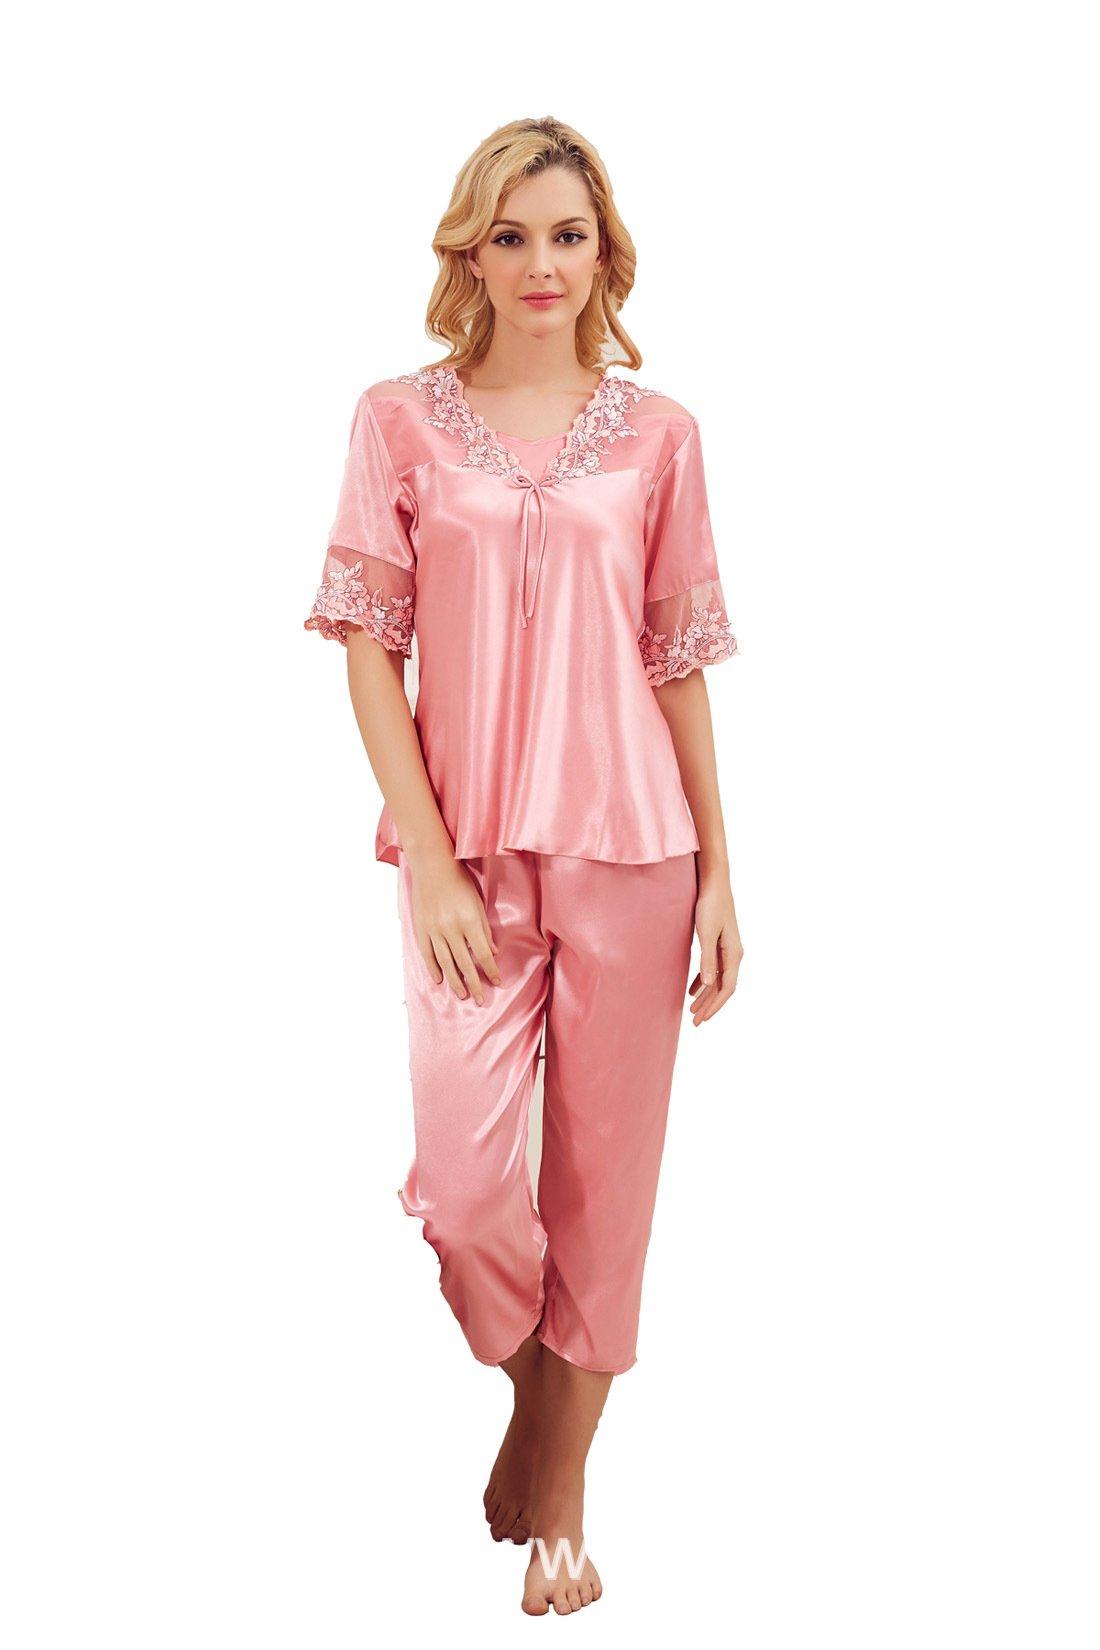 None-Brand Women's Satin Two Pieces Silk Pajamas Set Sleepwear Nightgown